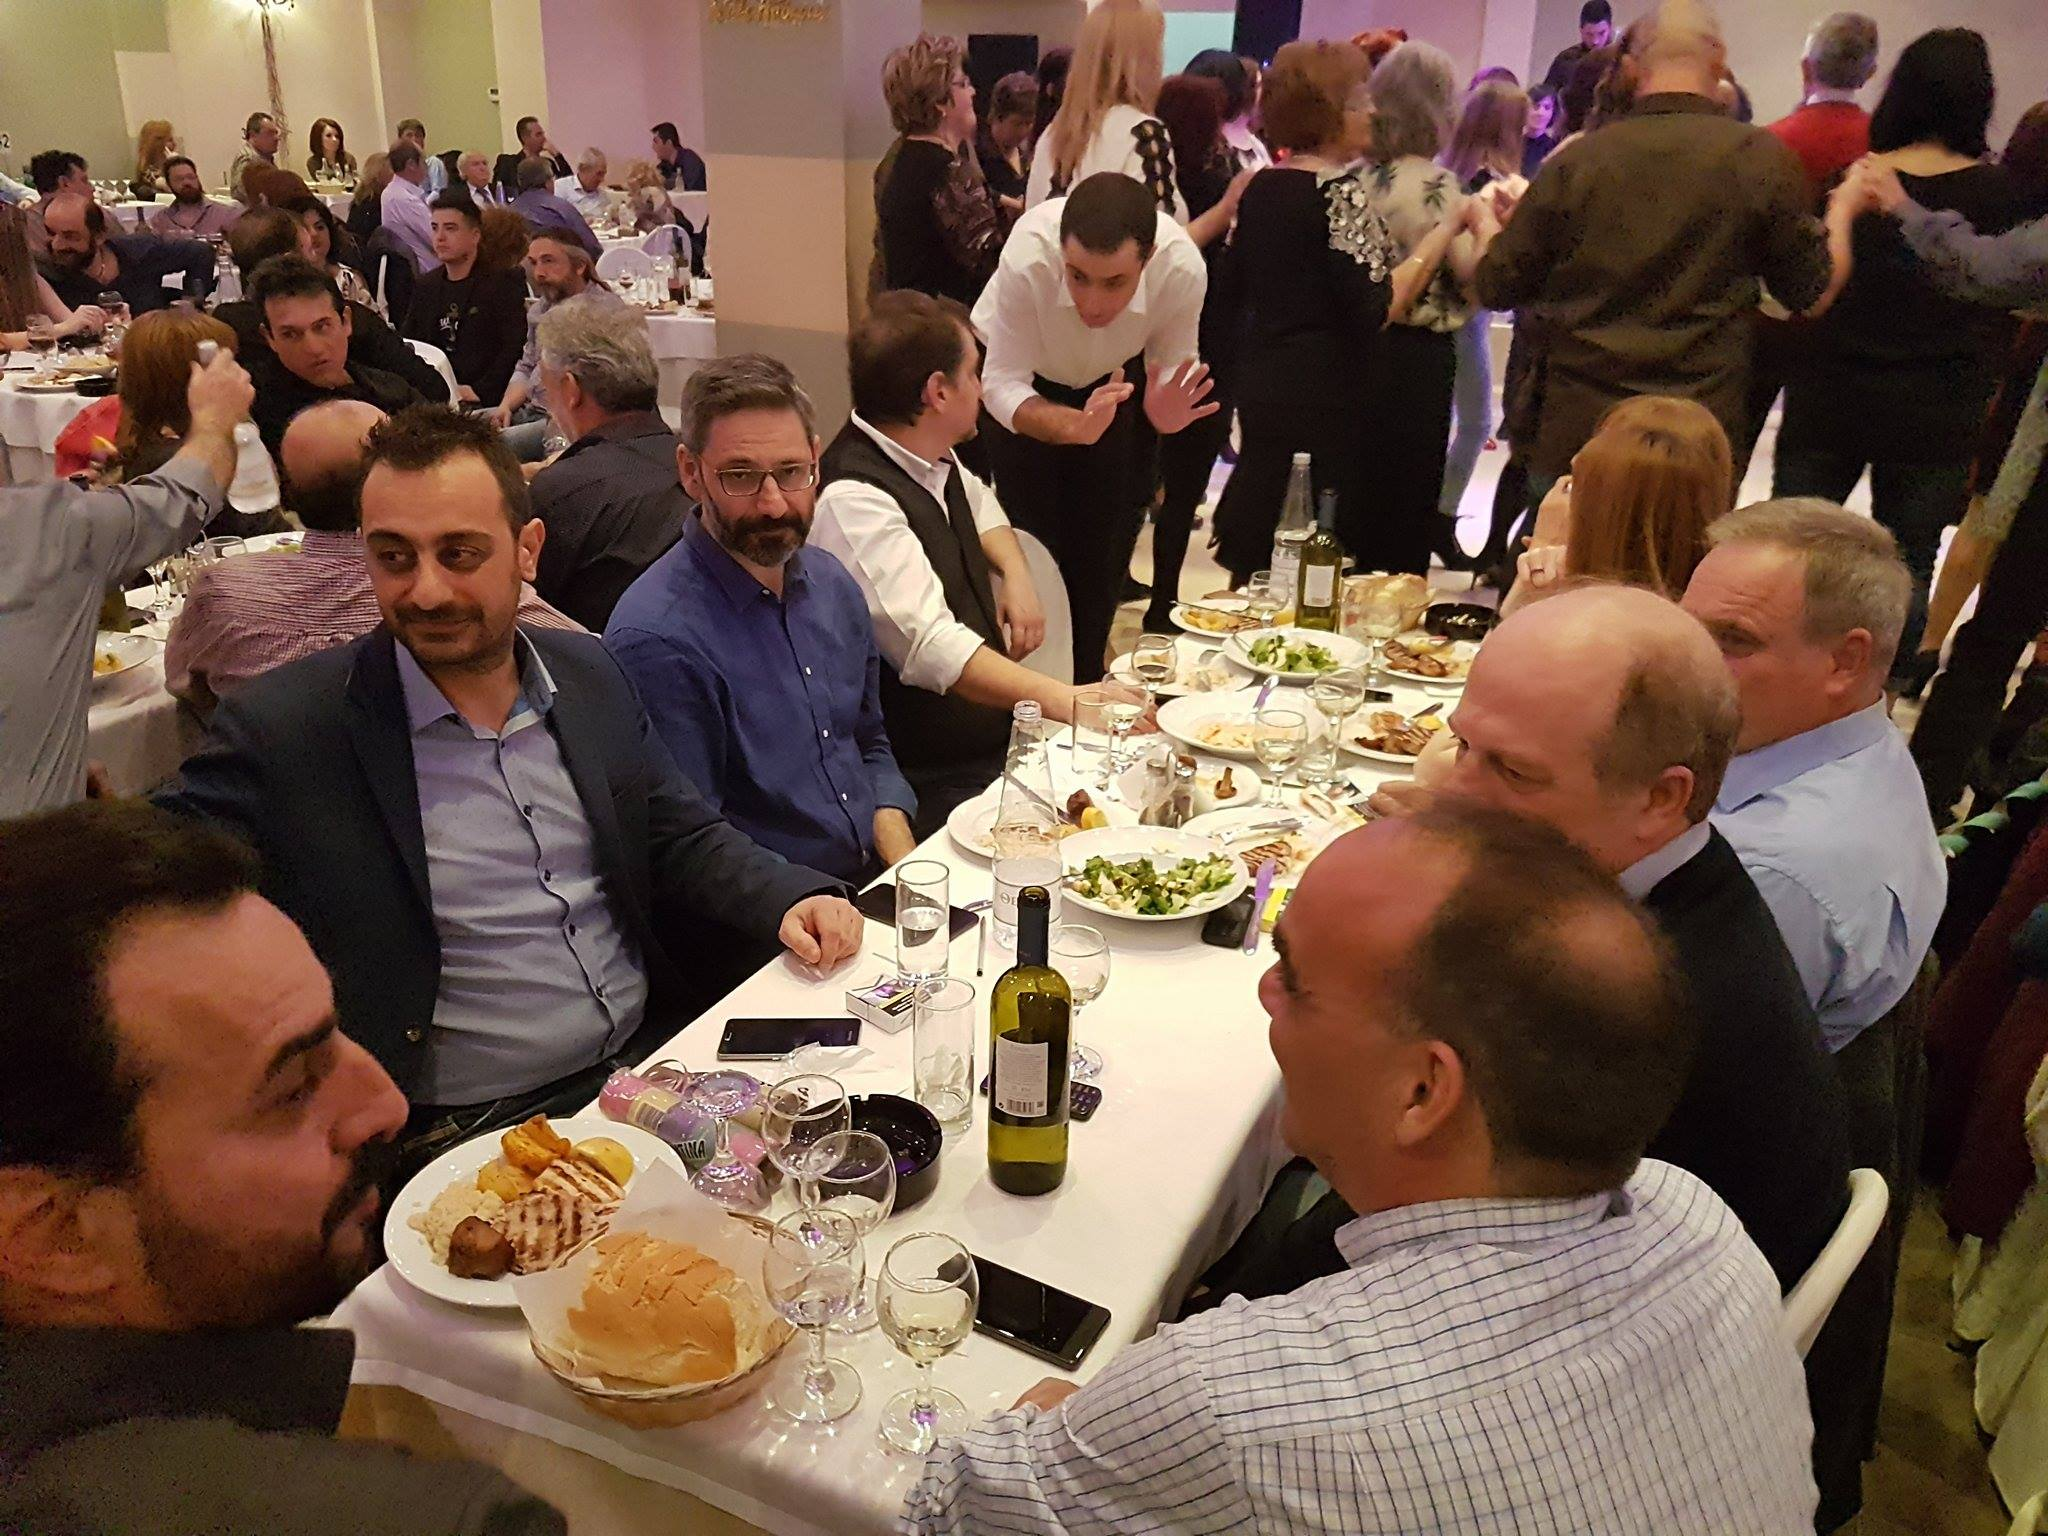 kozan.gr: Πολύ κέφι στο χορό του Συλλόγου Δημοτικών Υπαλλήλων Νομού Κοζάνης (Φωτογραφίες & Βίντεο)